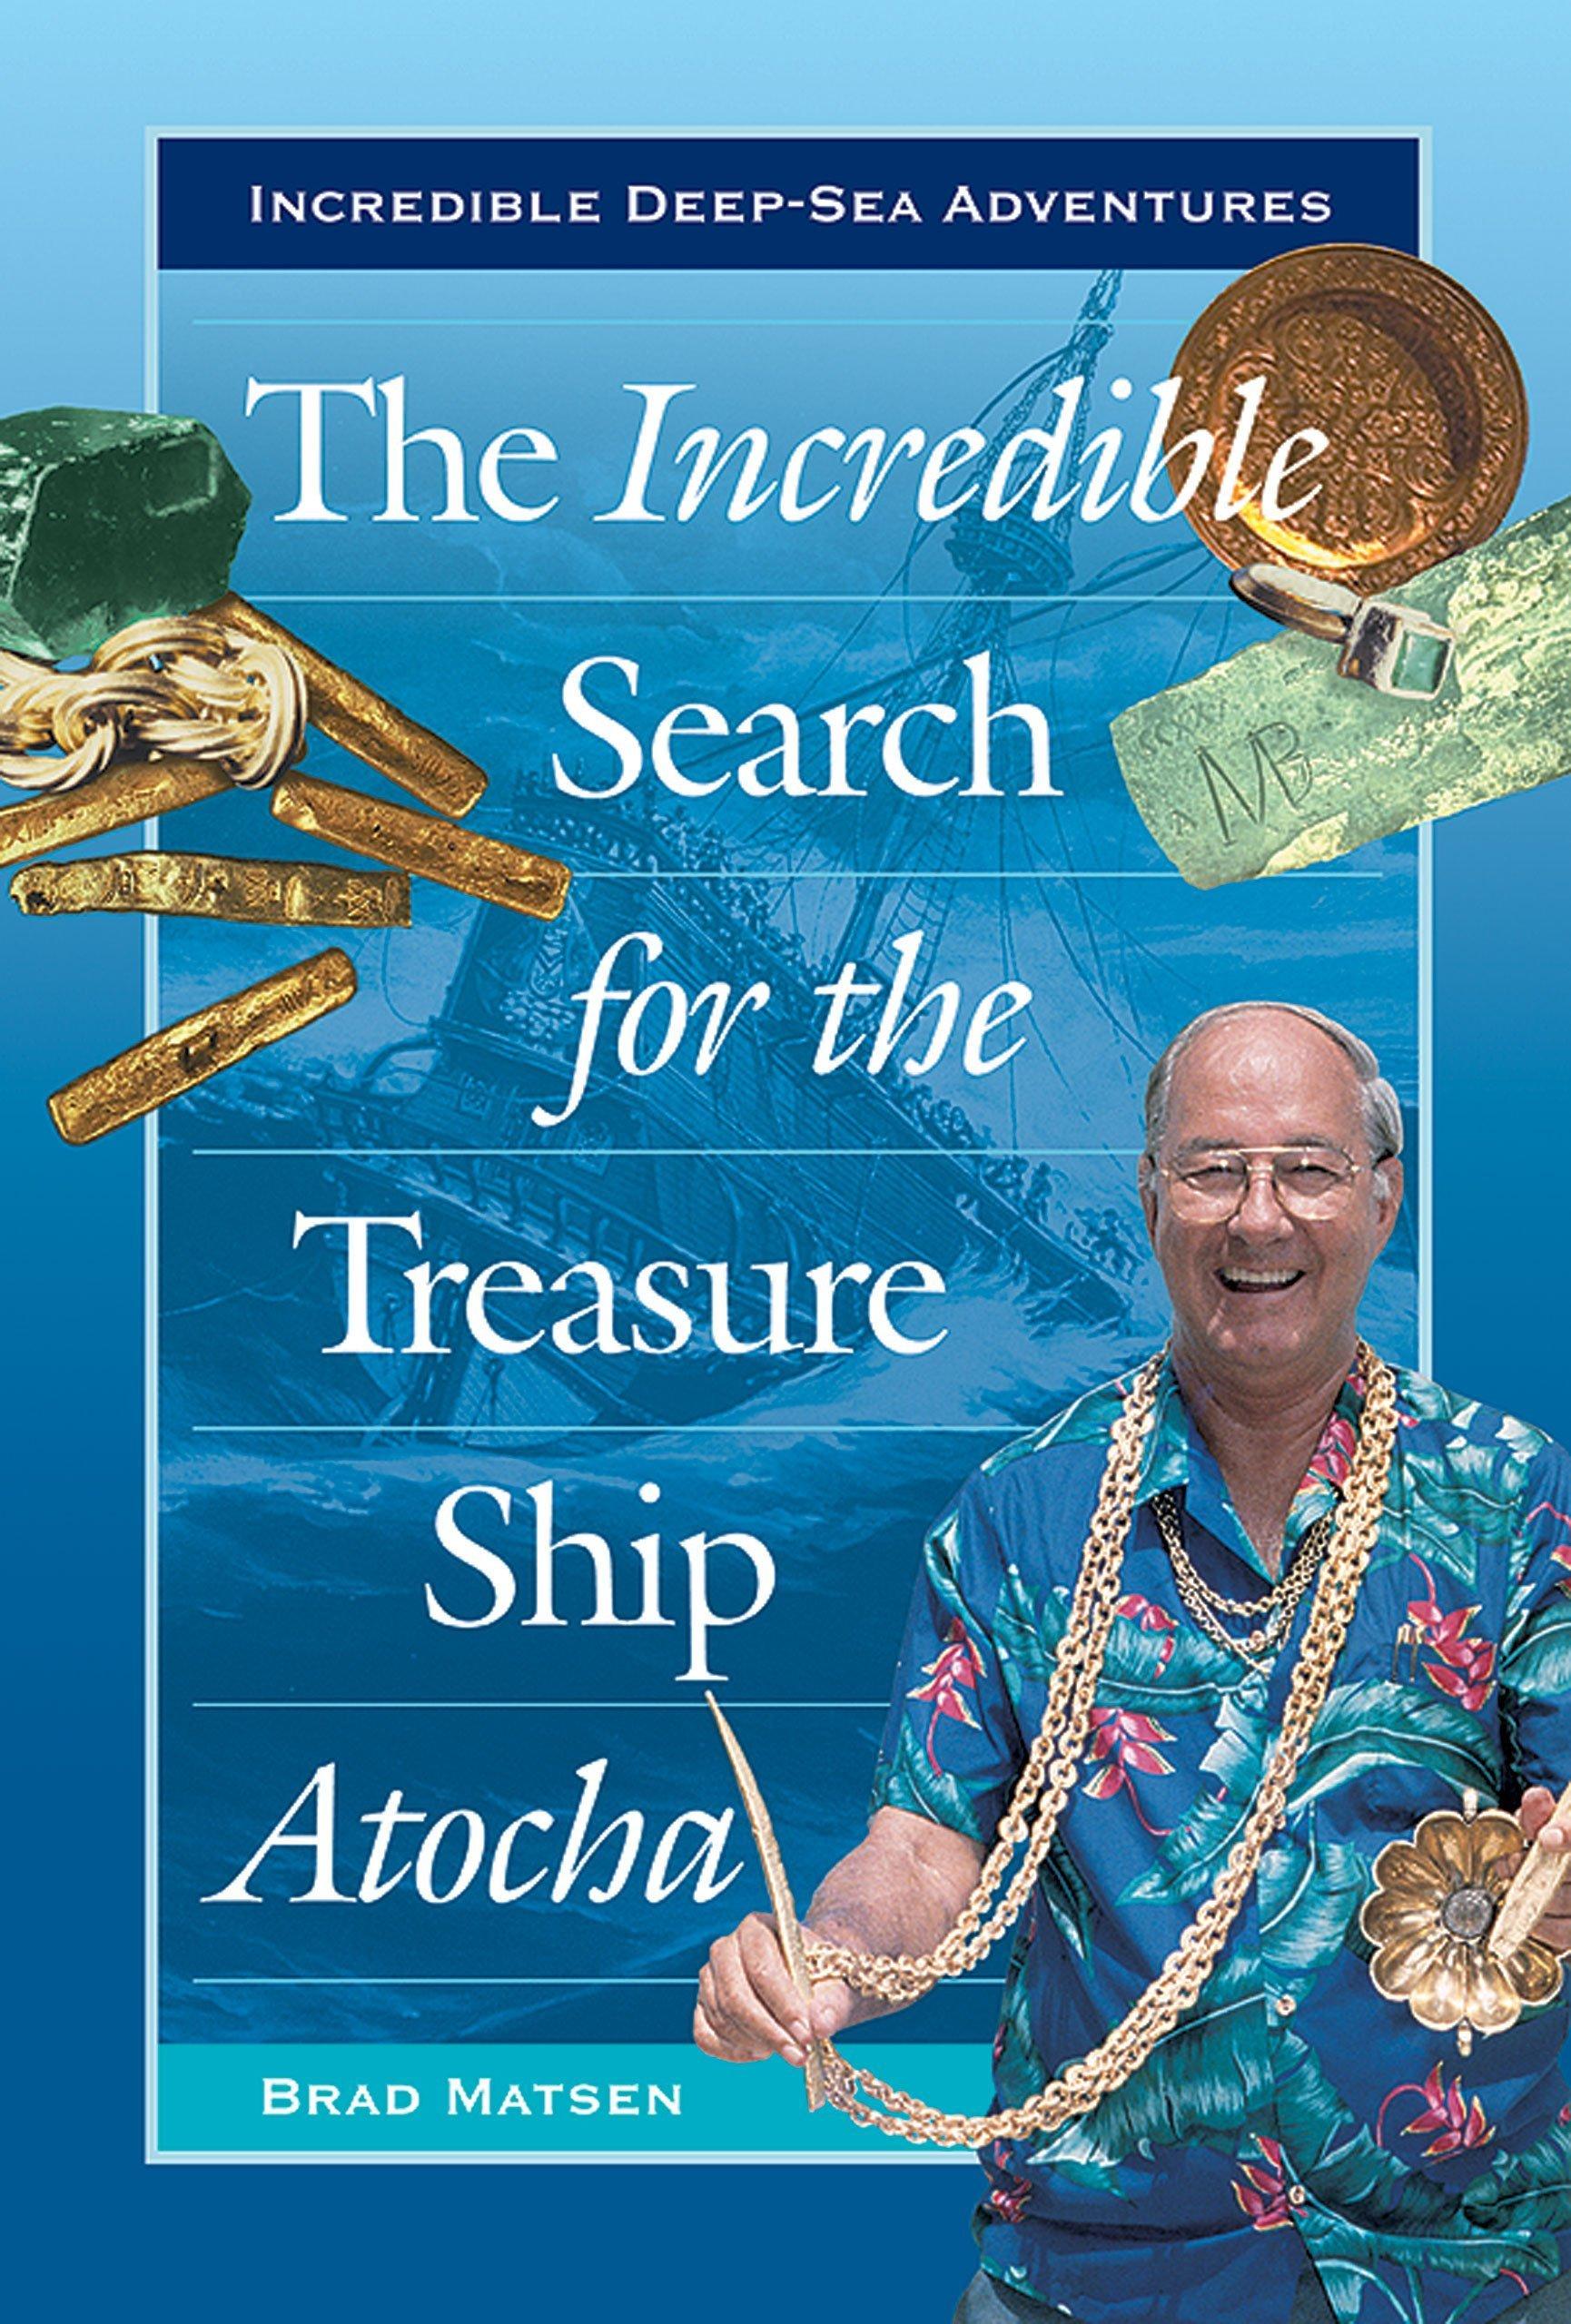 Download The Incredible Search for the Treasure Ship Atocha (Incredible Deep-Sea Adventures) PDF